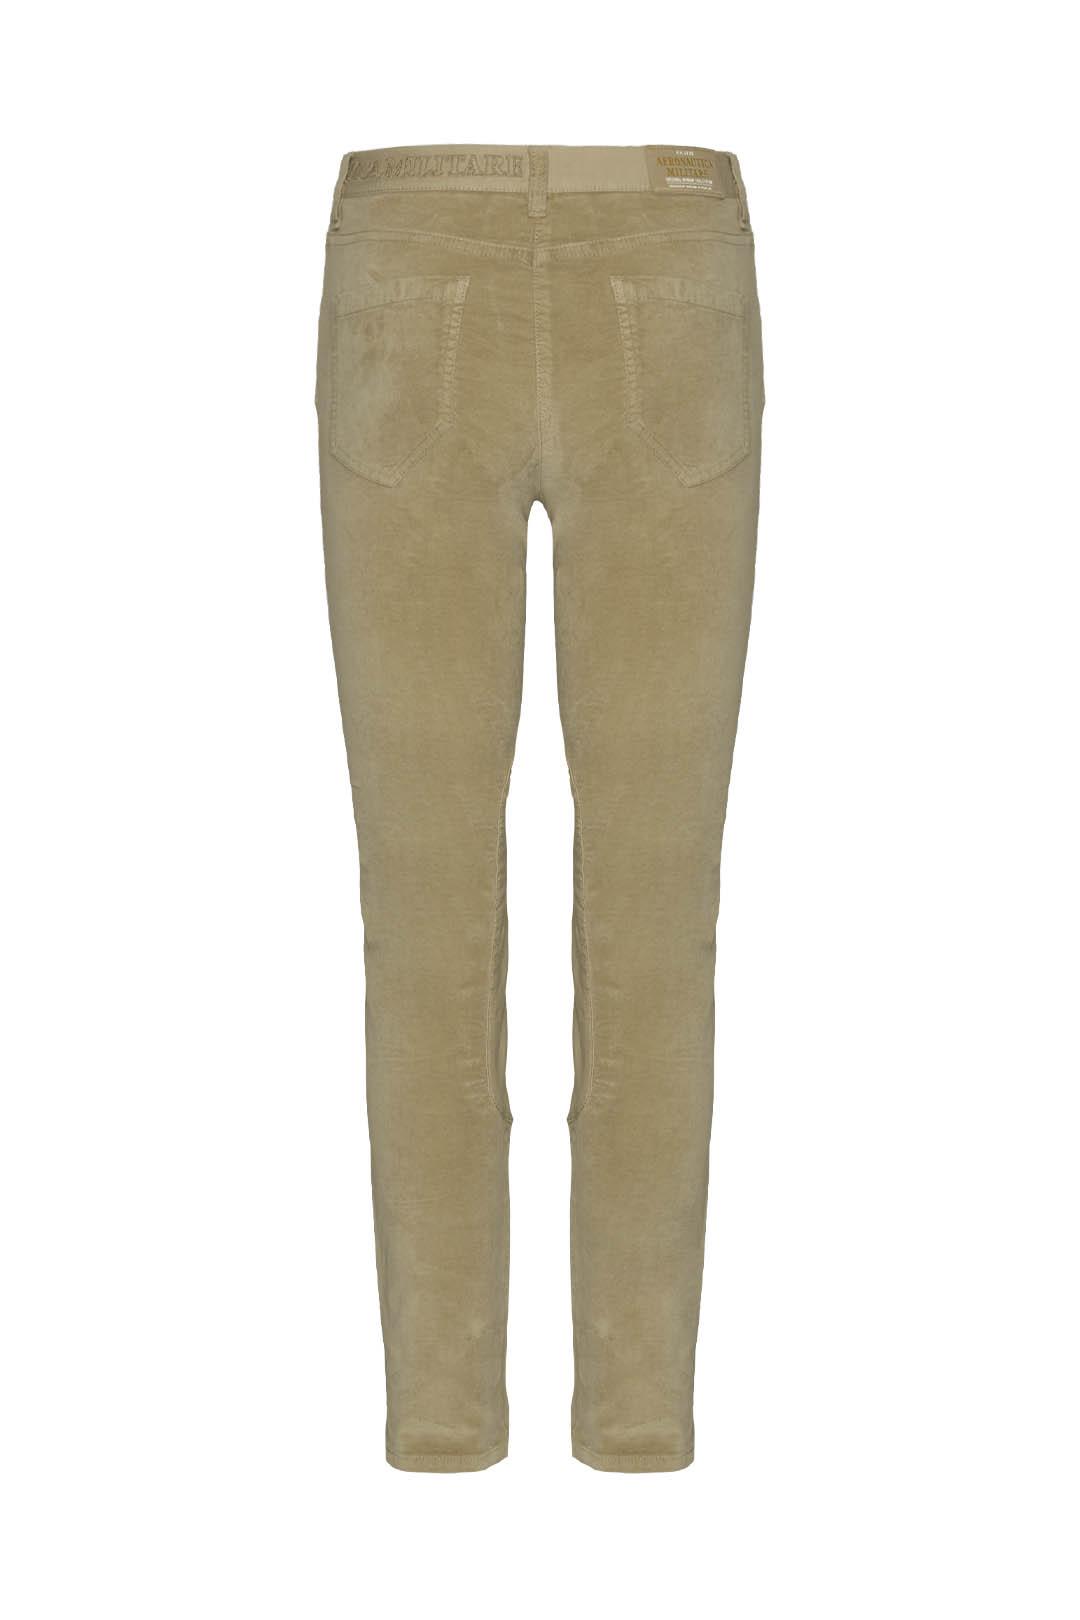 5-pockets velvet trousers with satin     2